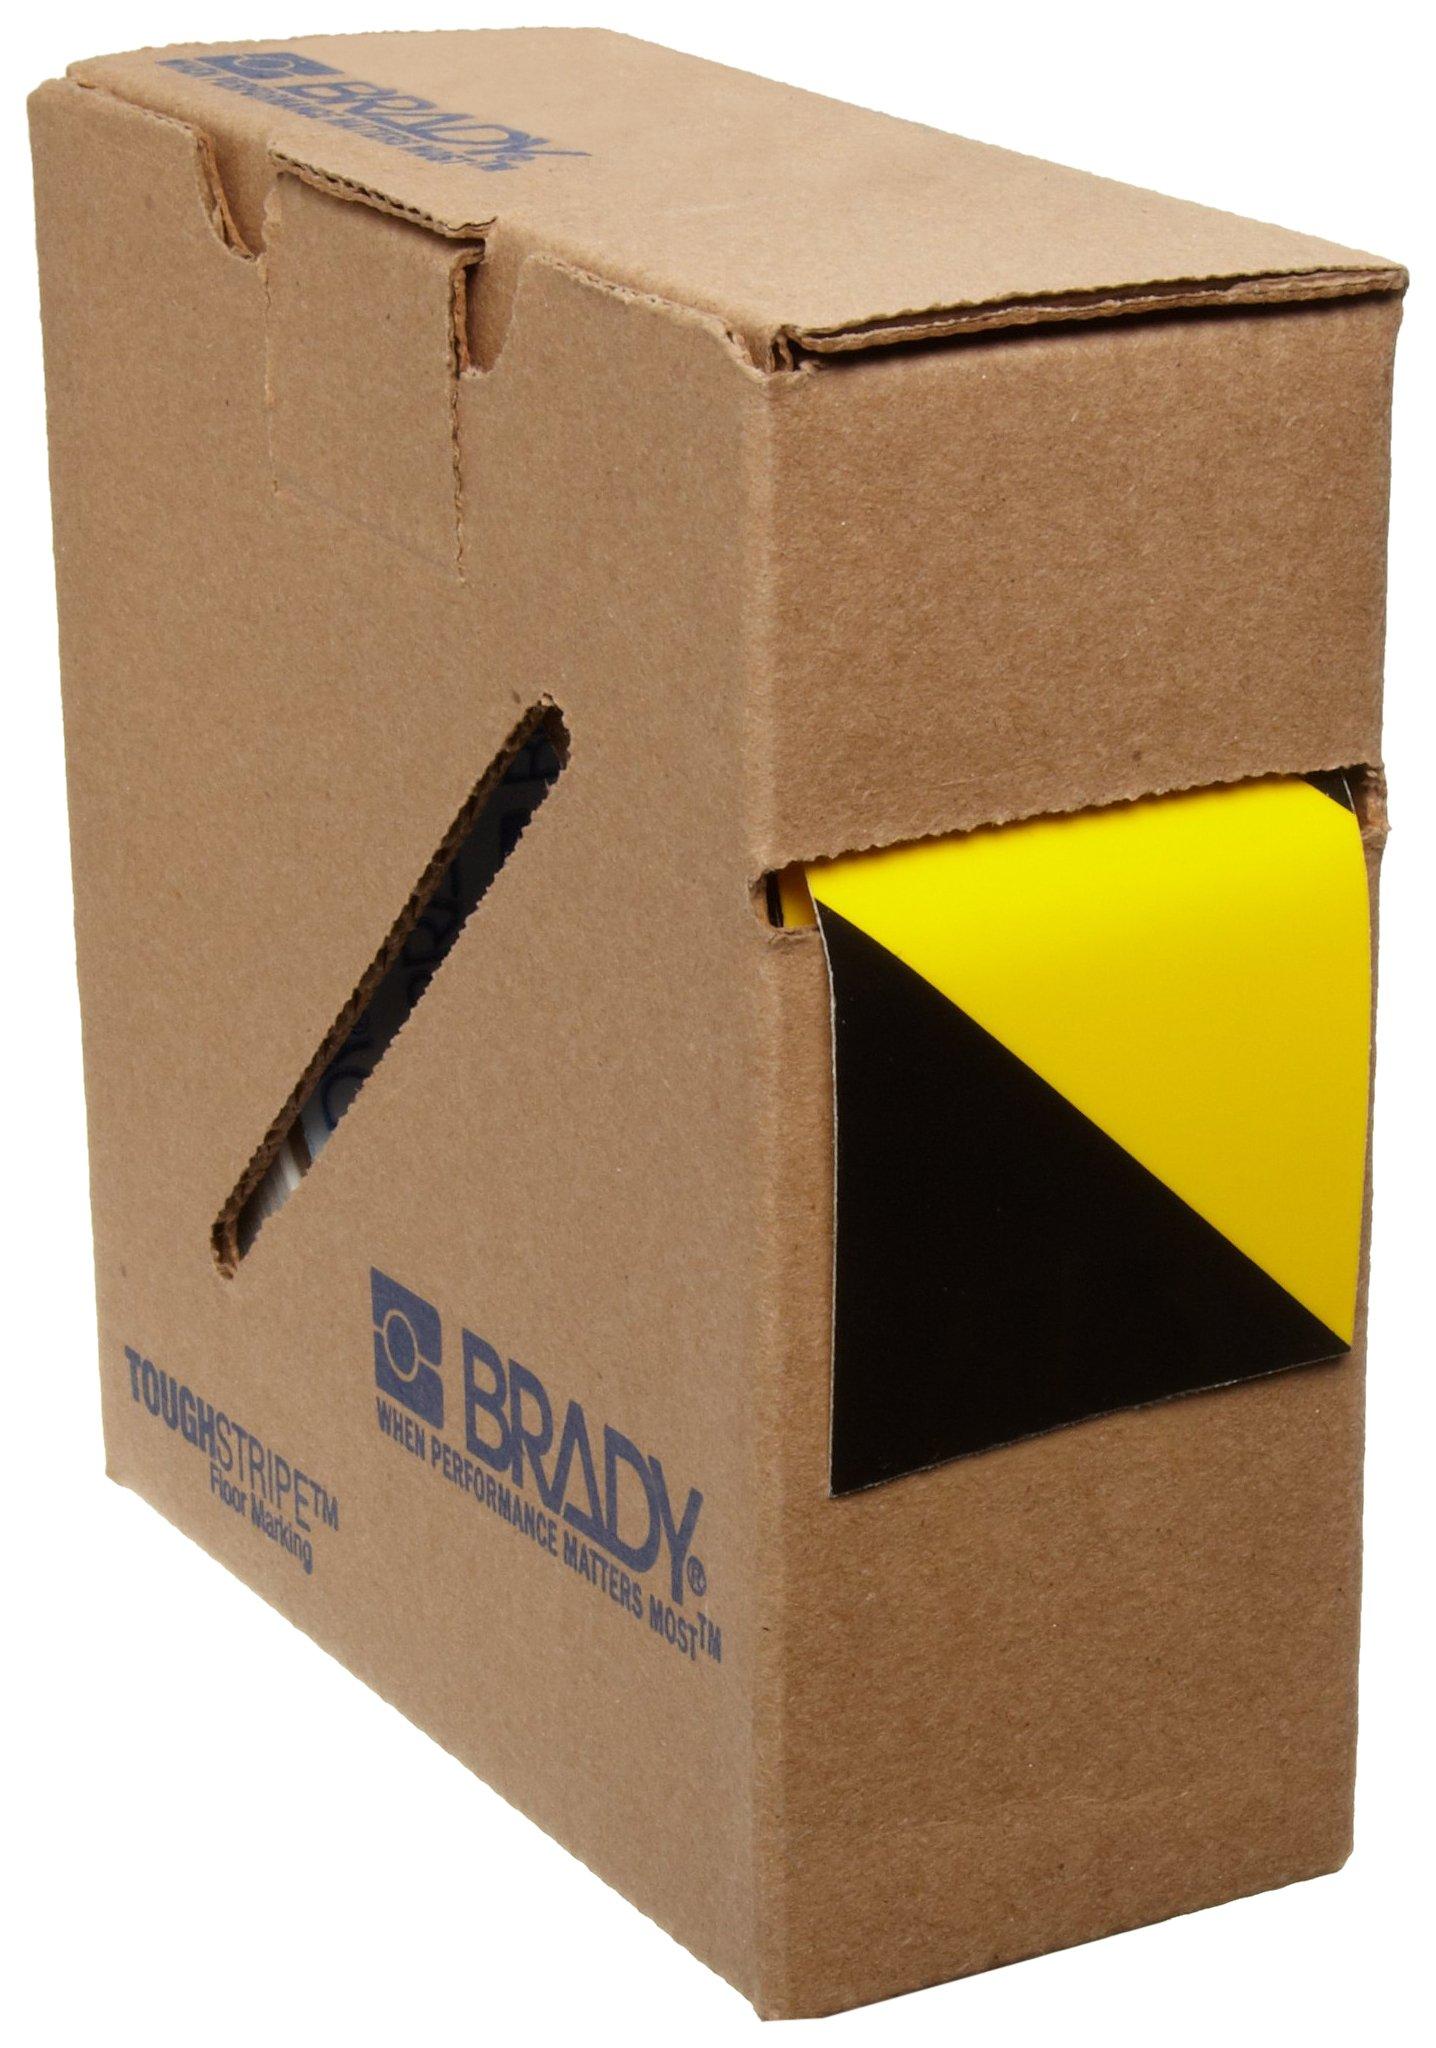 Brady ToughStripe Floor Marking Tape - Yellow and Black, Non-Abrasive Tape - 2'' Width, 100' Length by Brady